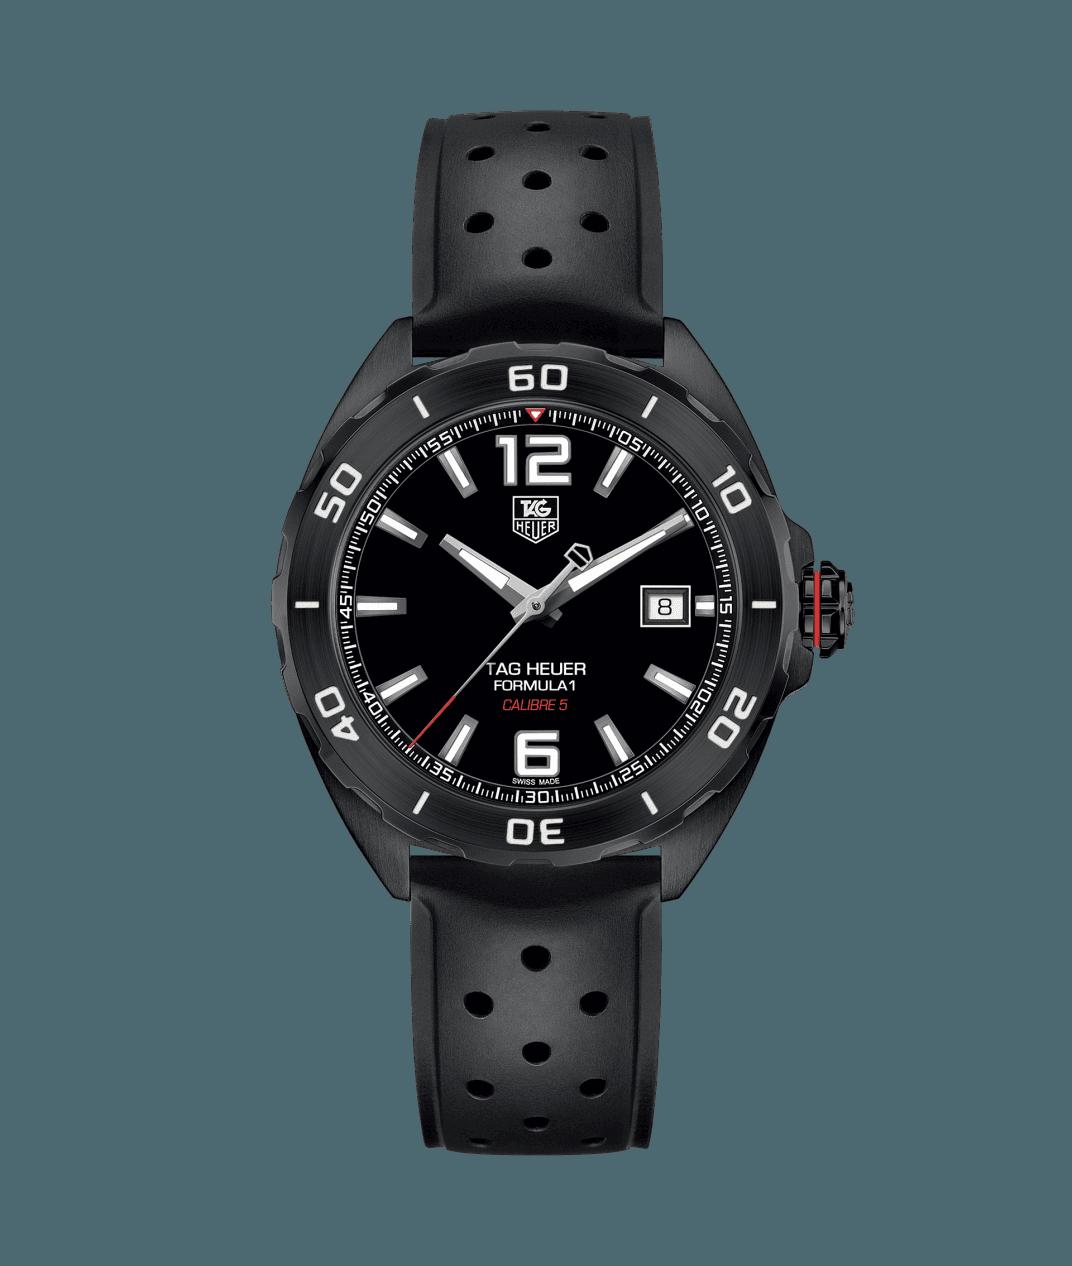 Tag-Heuer-Montre-Formula-1-Calibre-5-Hall-of-Time-WAZ2115-FT8023